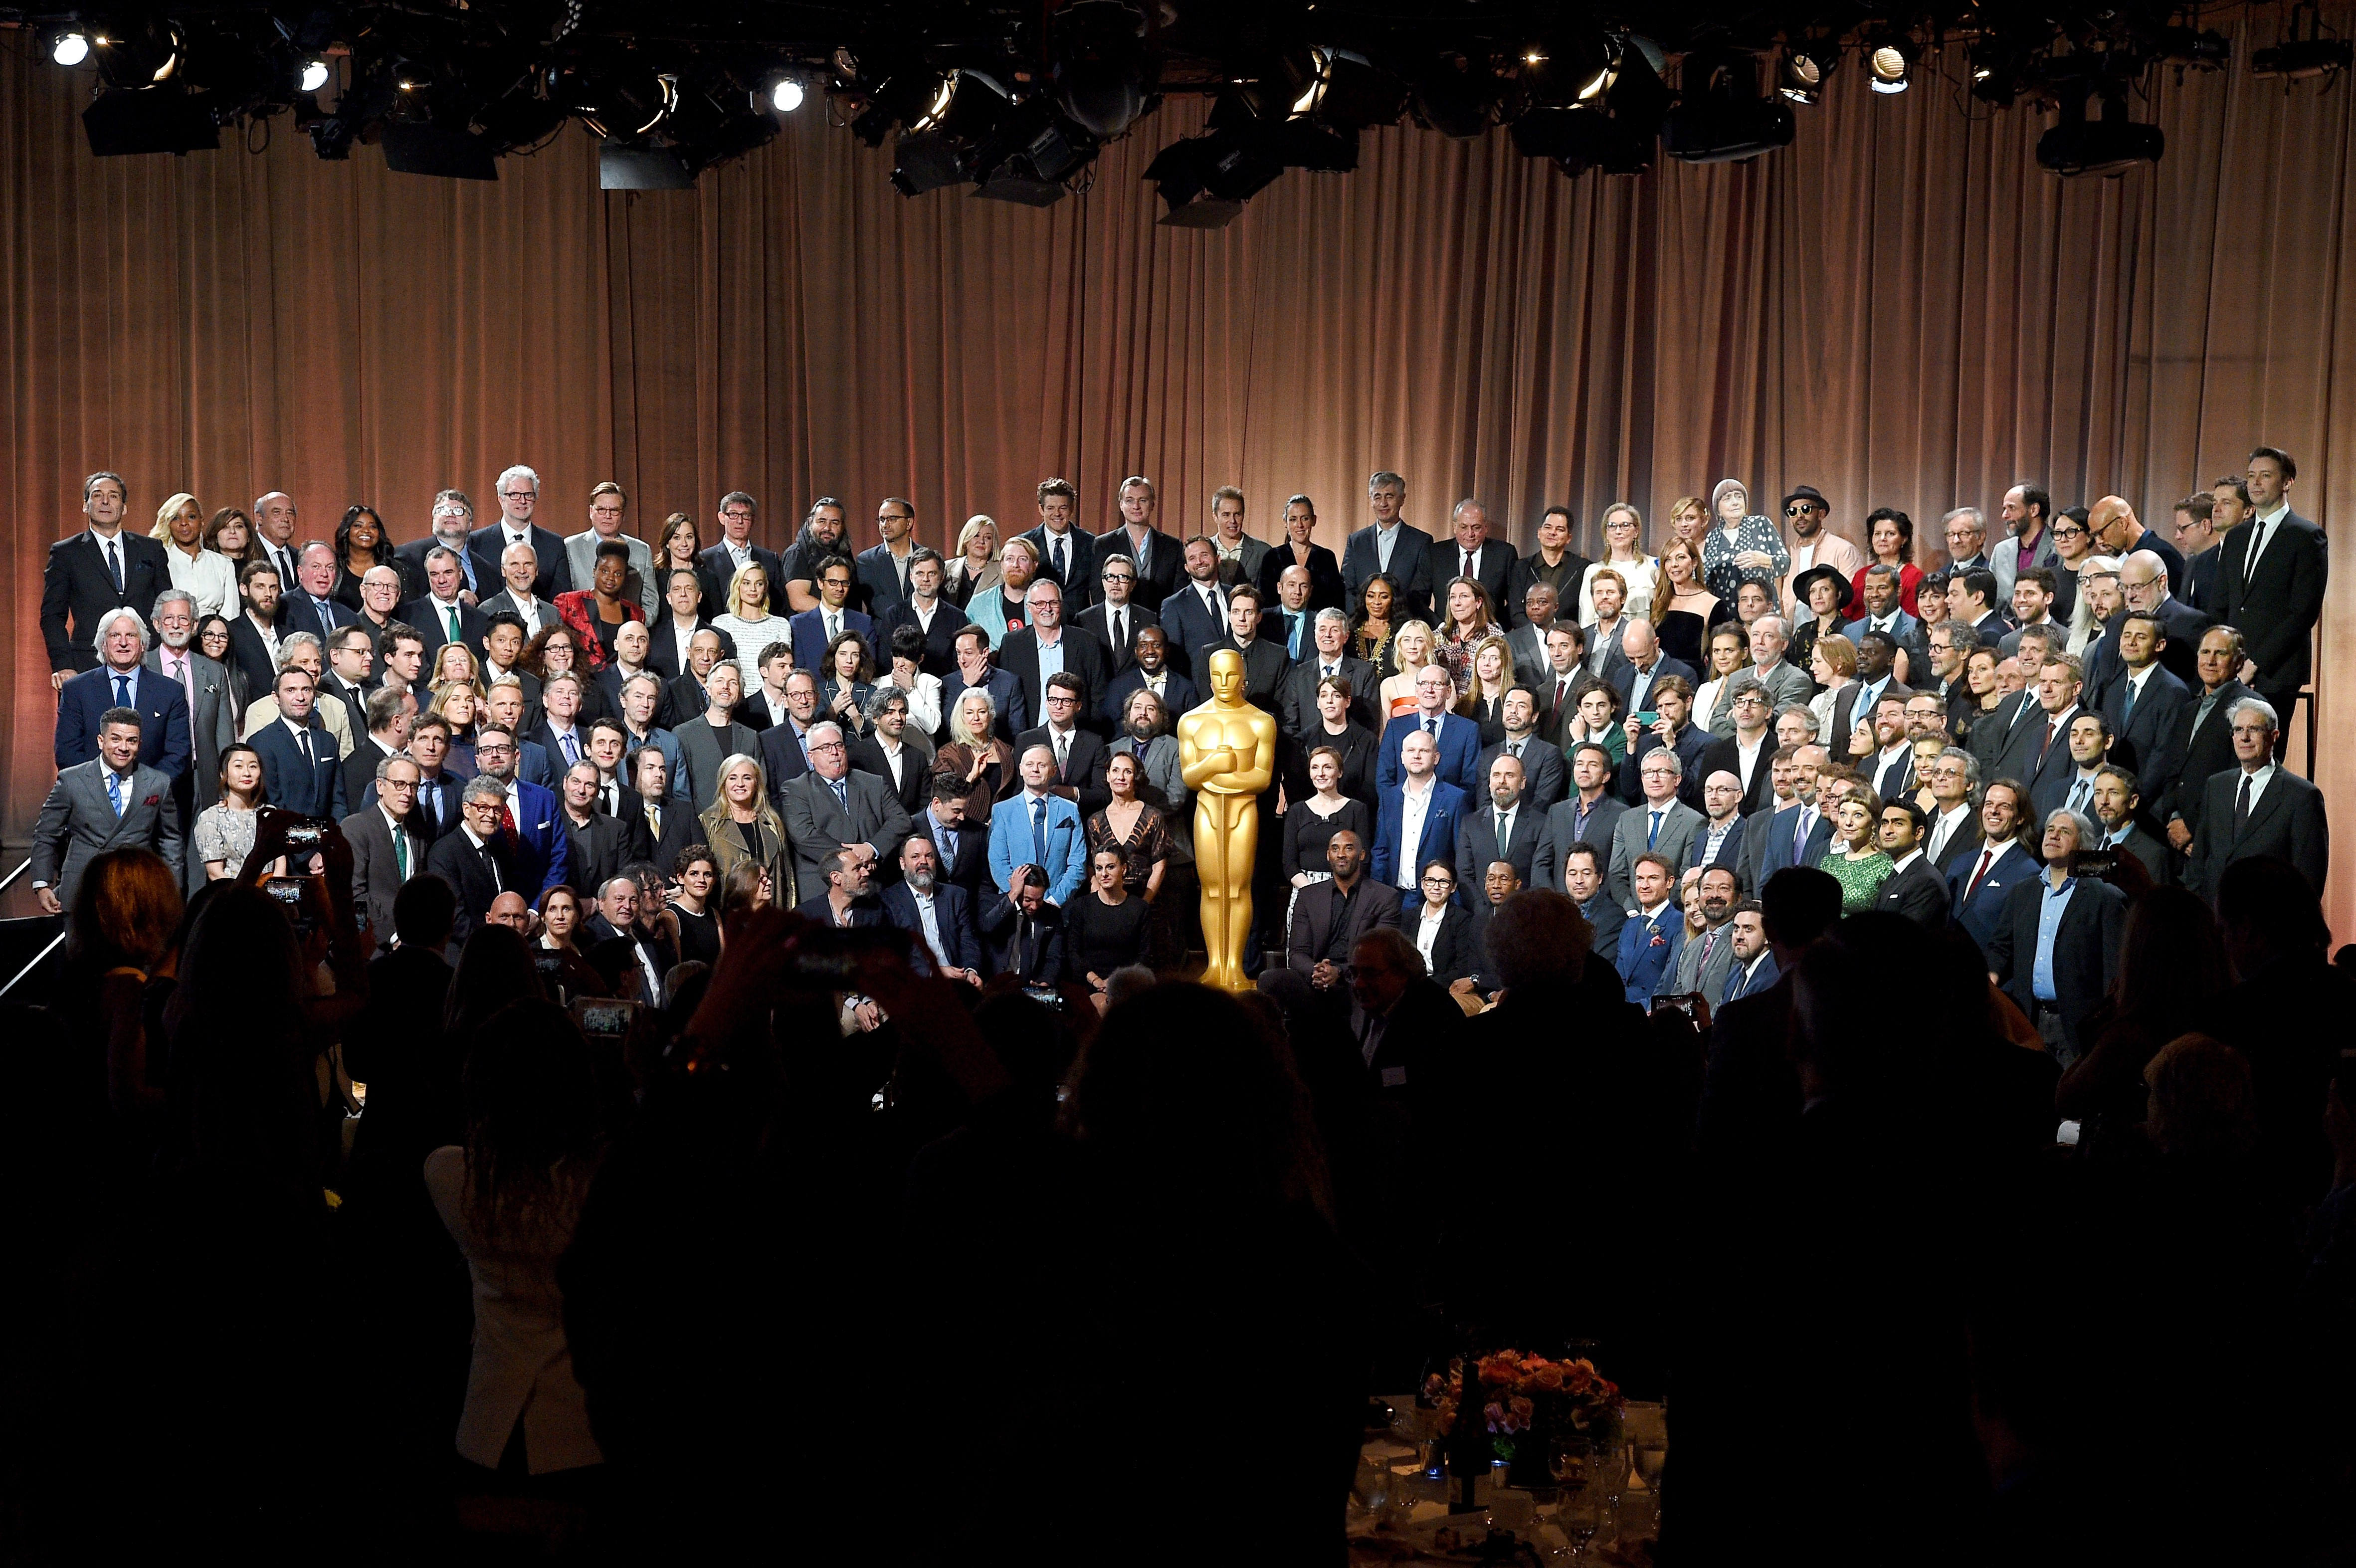 Indicados ao Oscar 2018 (Foto: Getty Images)